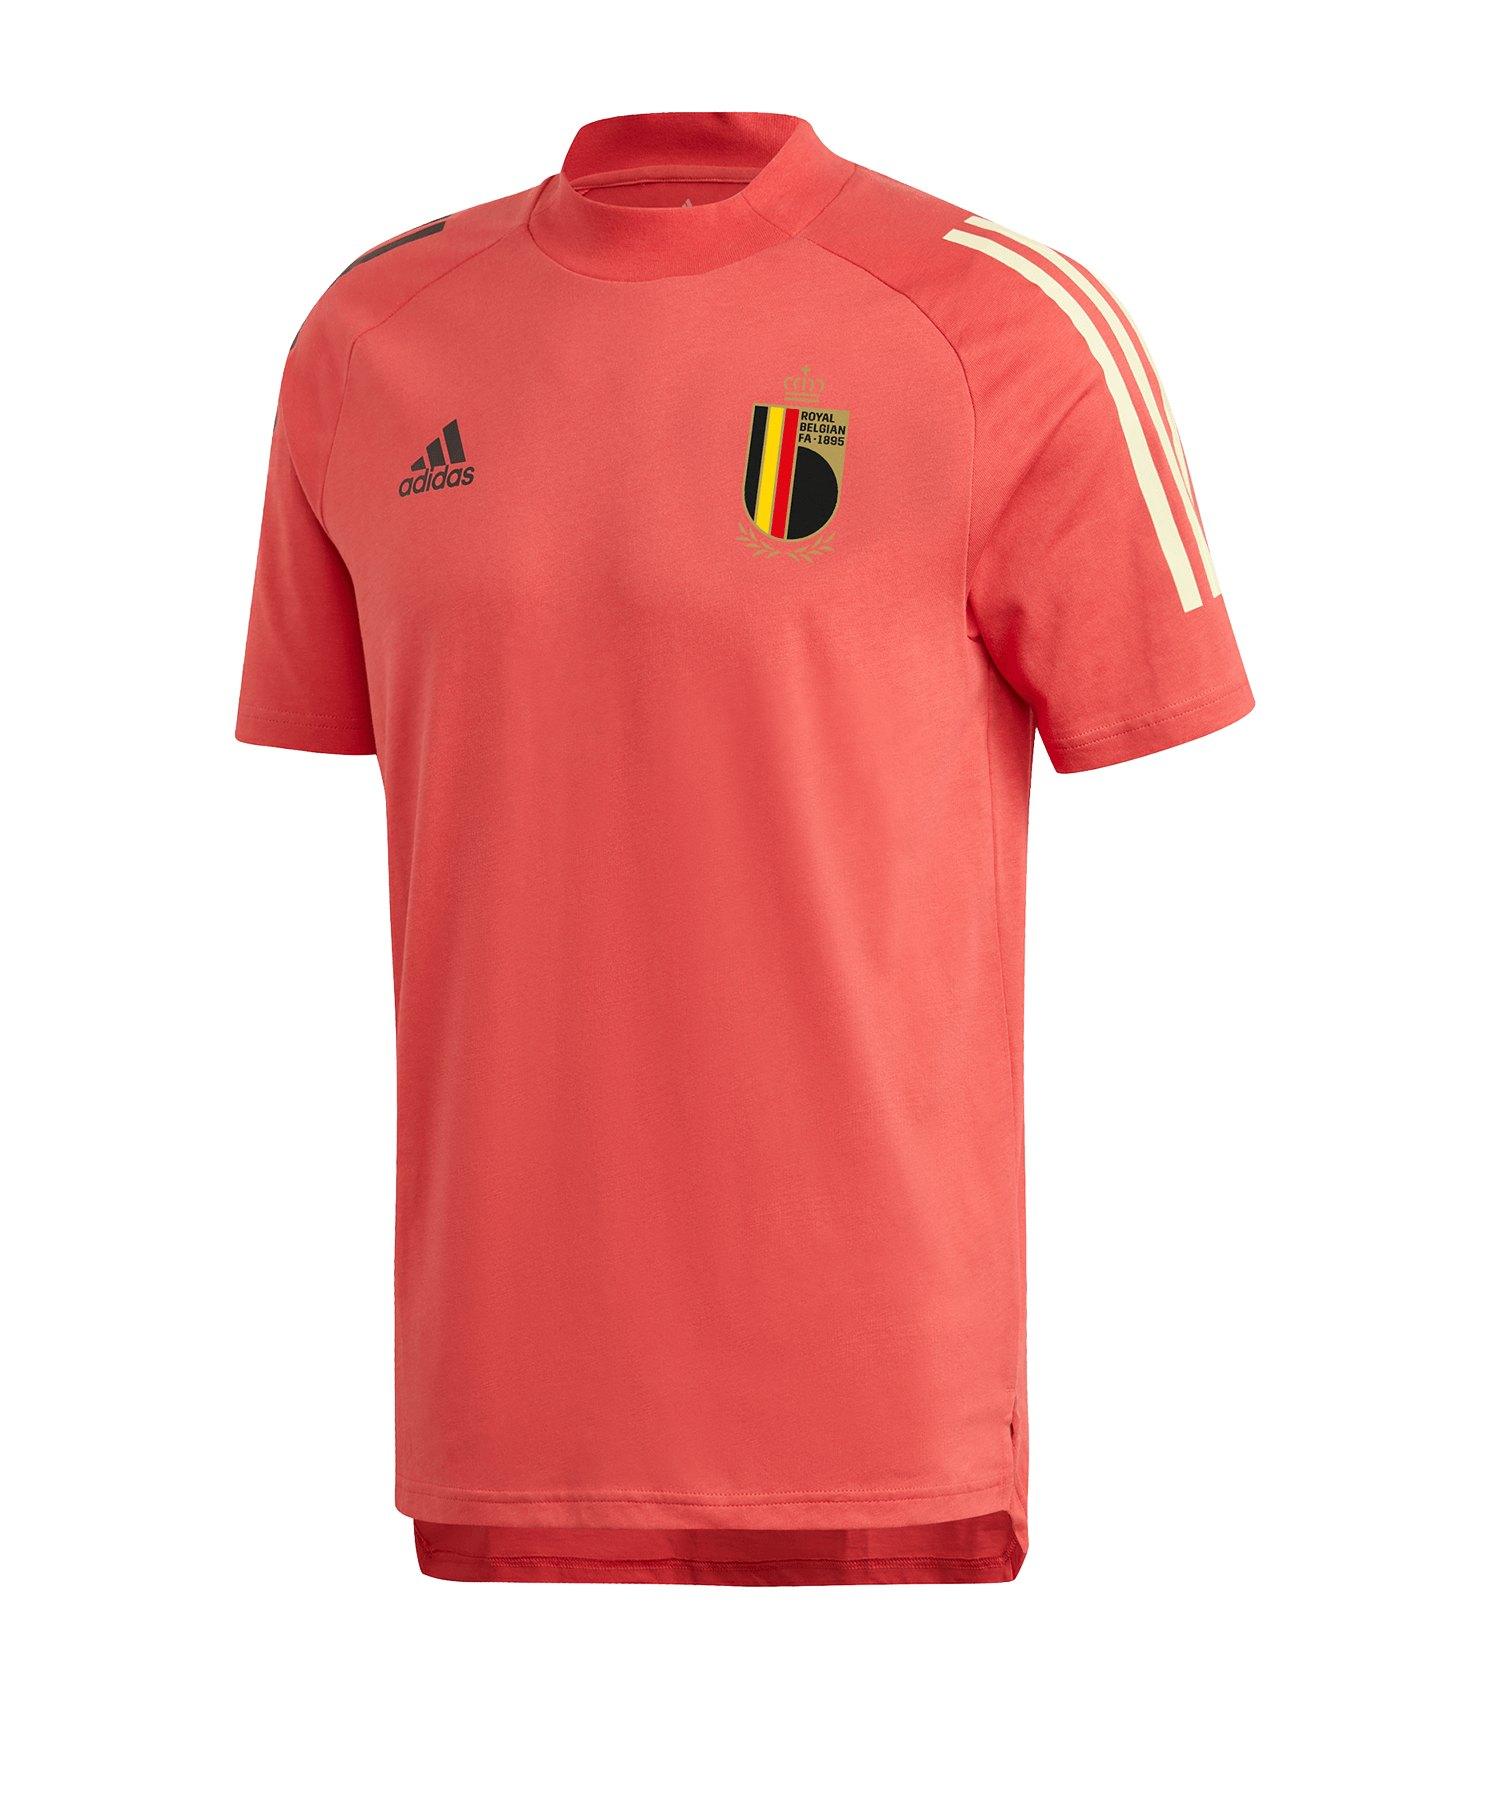 adidas Belgien Tee T-Shirt Rot - rot